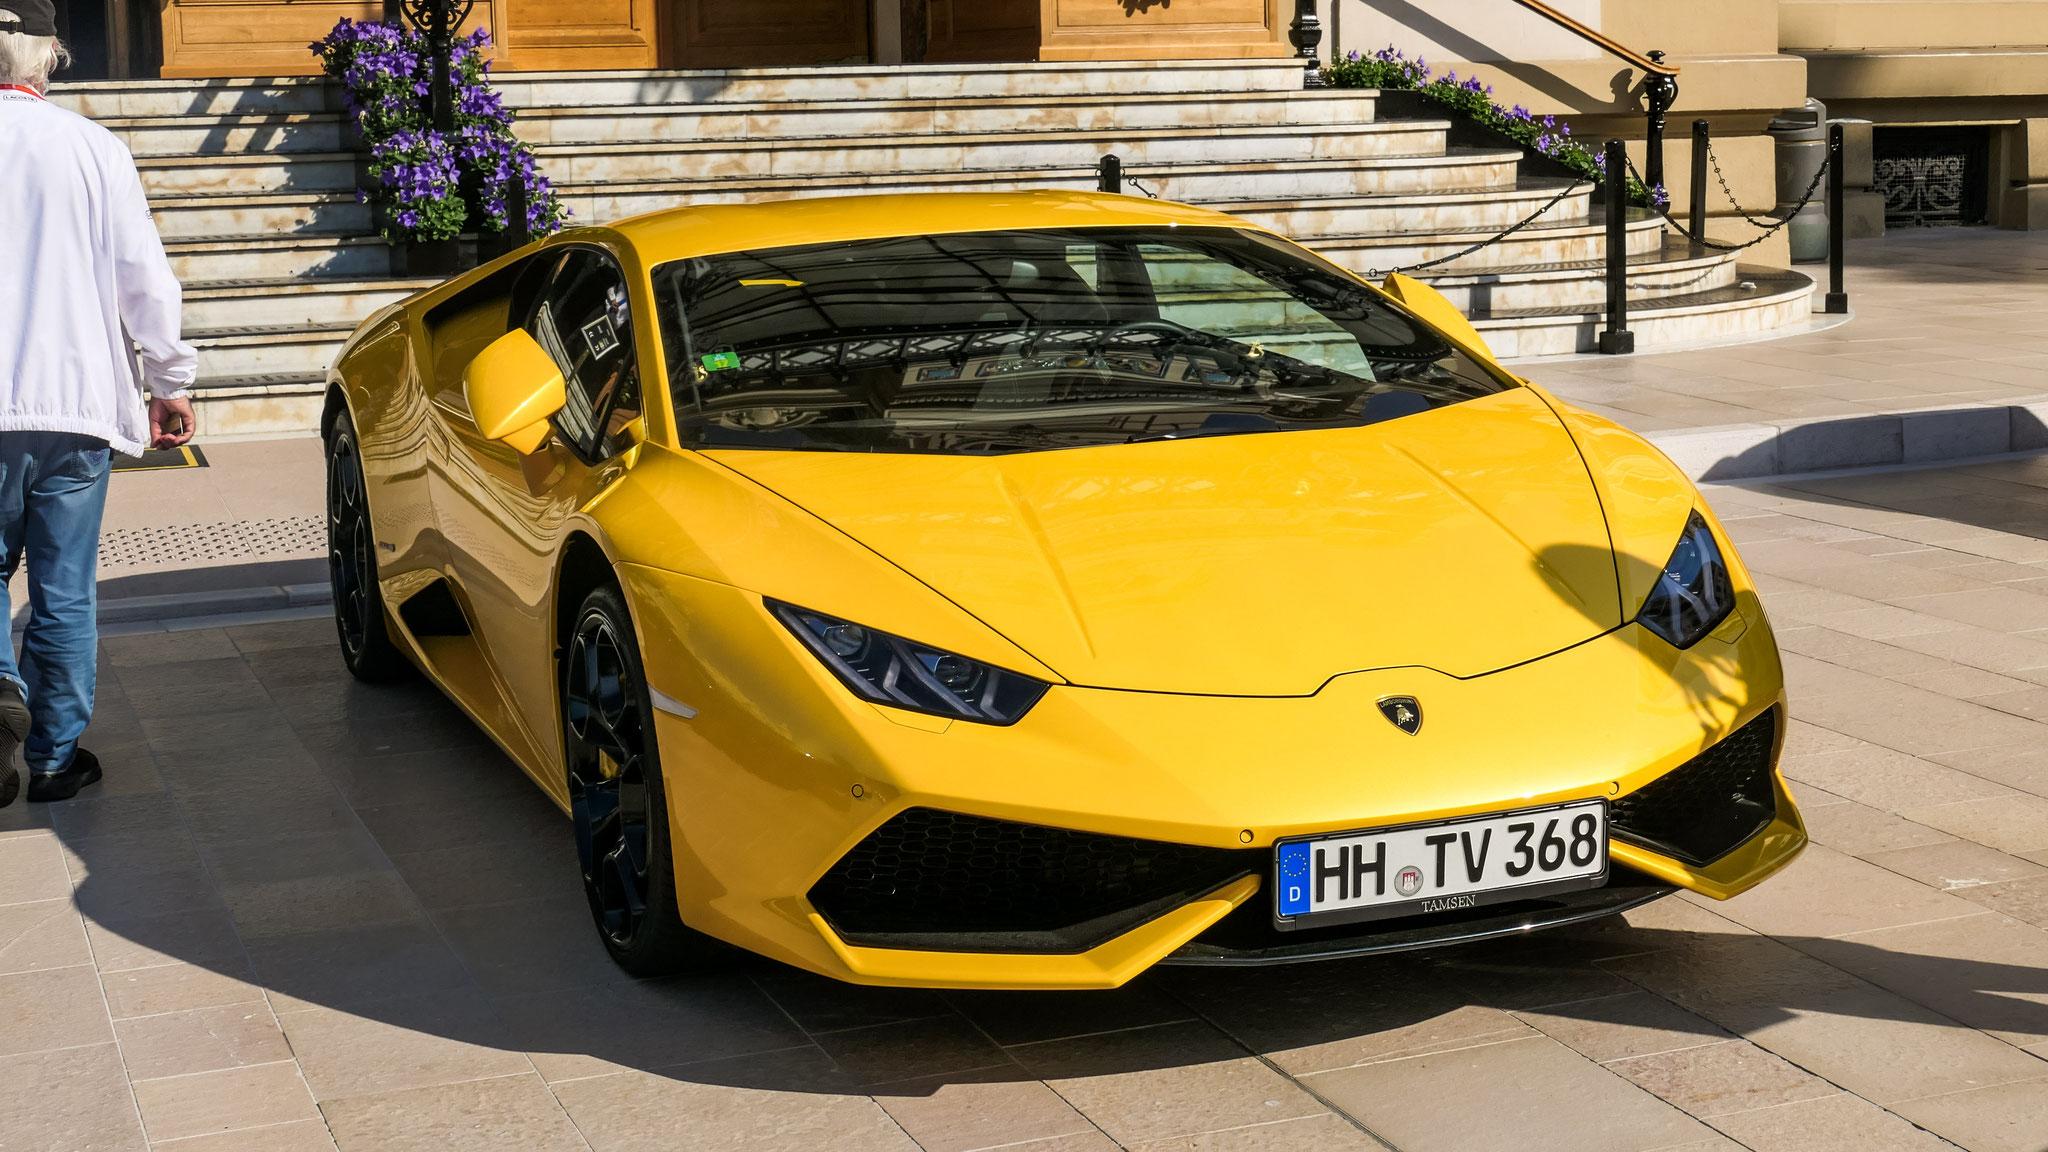 Lamborghini Huracan - HH-TV-368